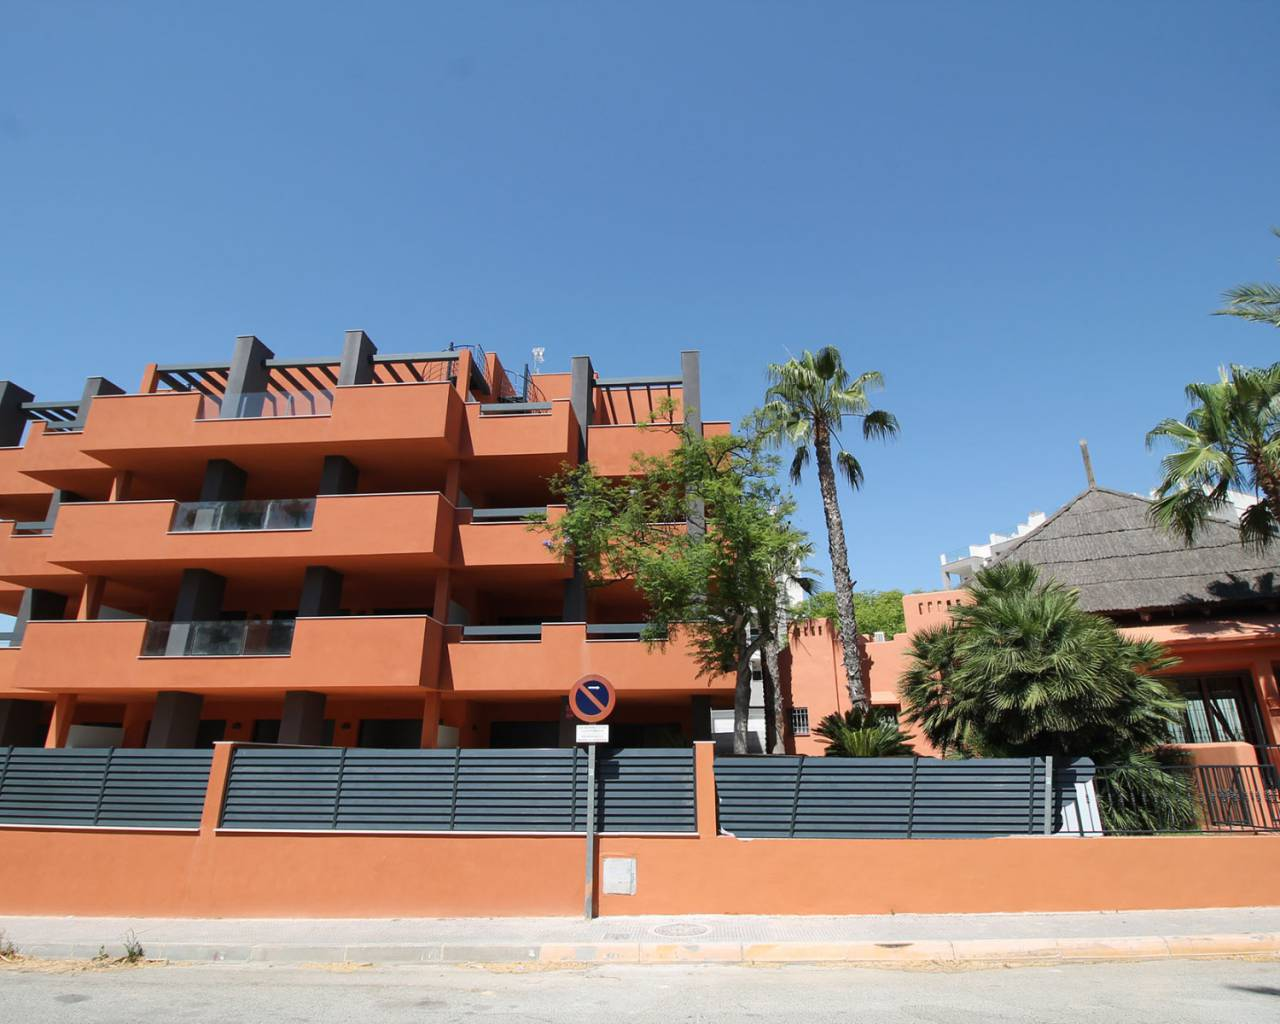 nieuwbouw-appartement-orihuela-costa-villamartin-golf_3291_xl